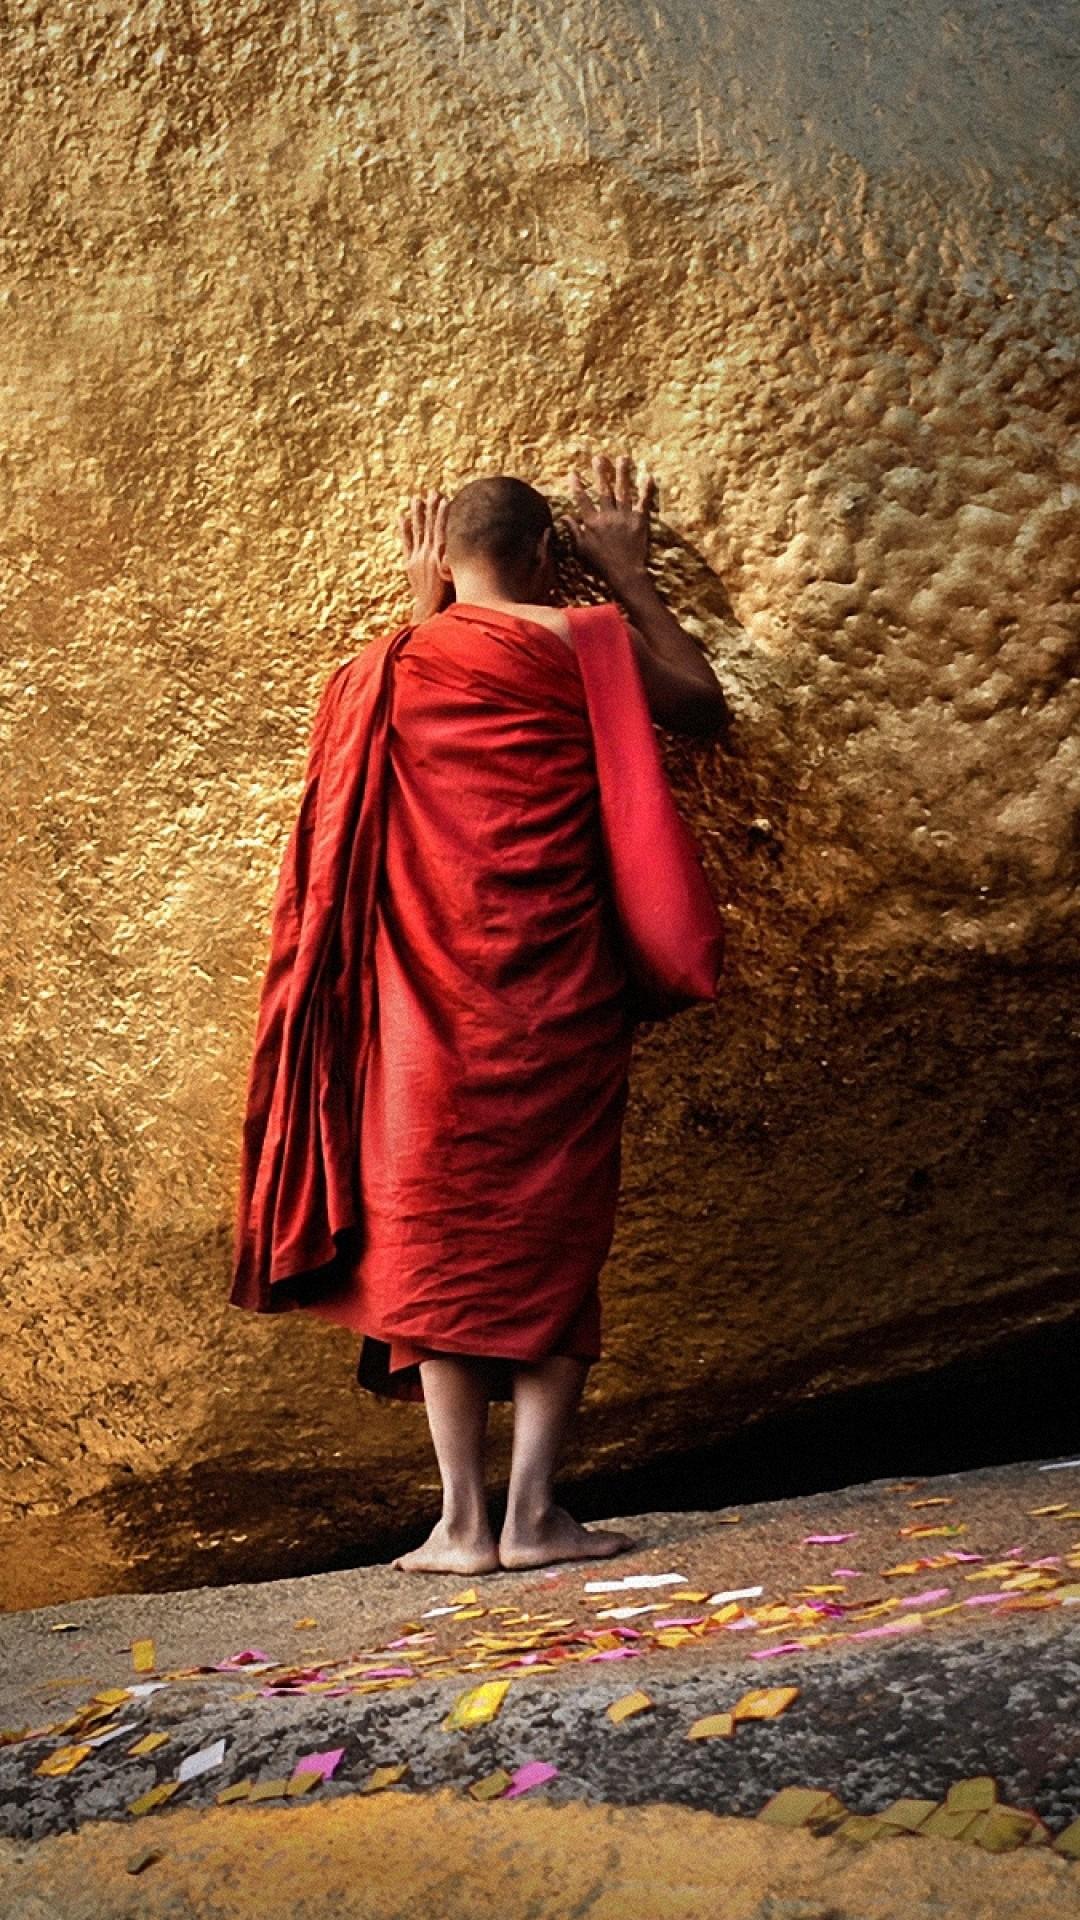 Preview wallpaper buddha, chayttiyo pagoda, golden hill, monk, burma,  myanmar 1080×1920